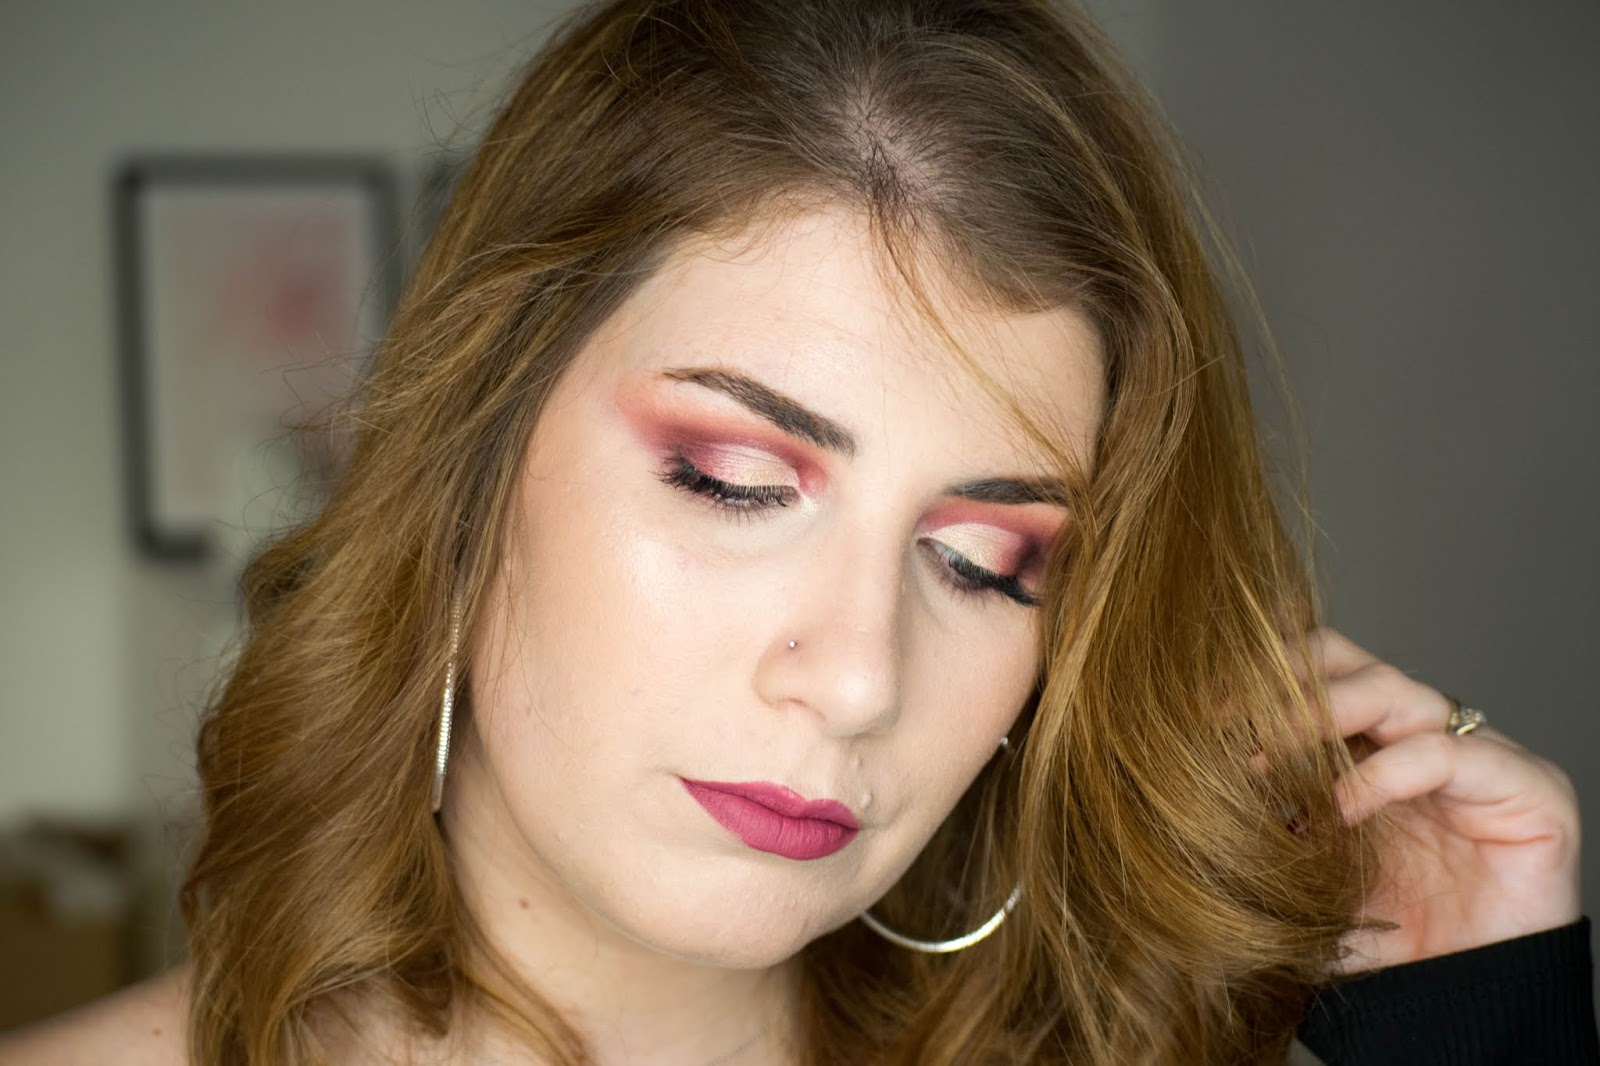 makeup revolution imogenation maquibeauty